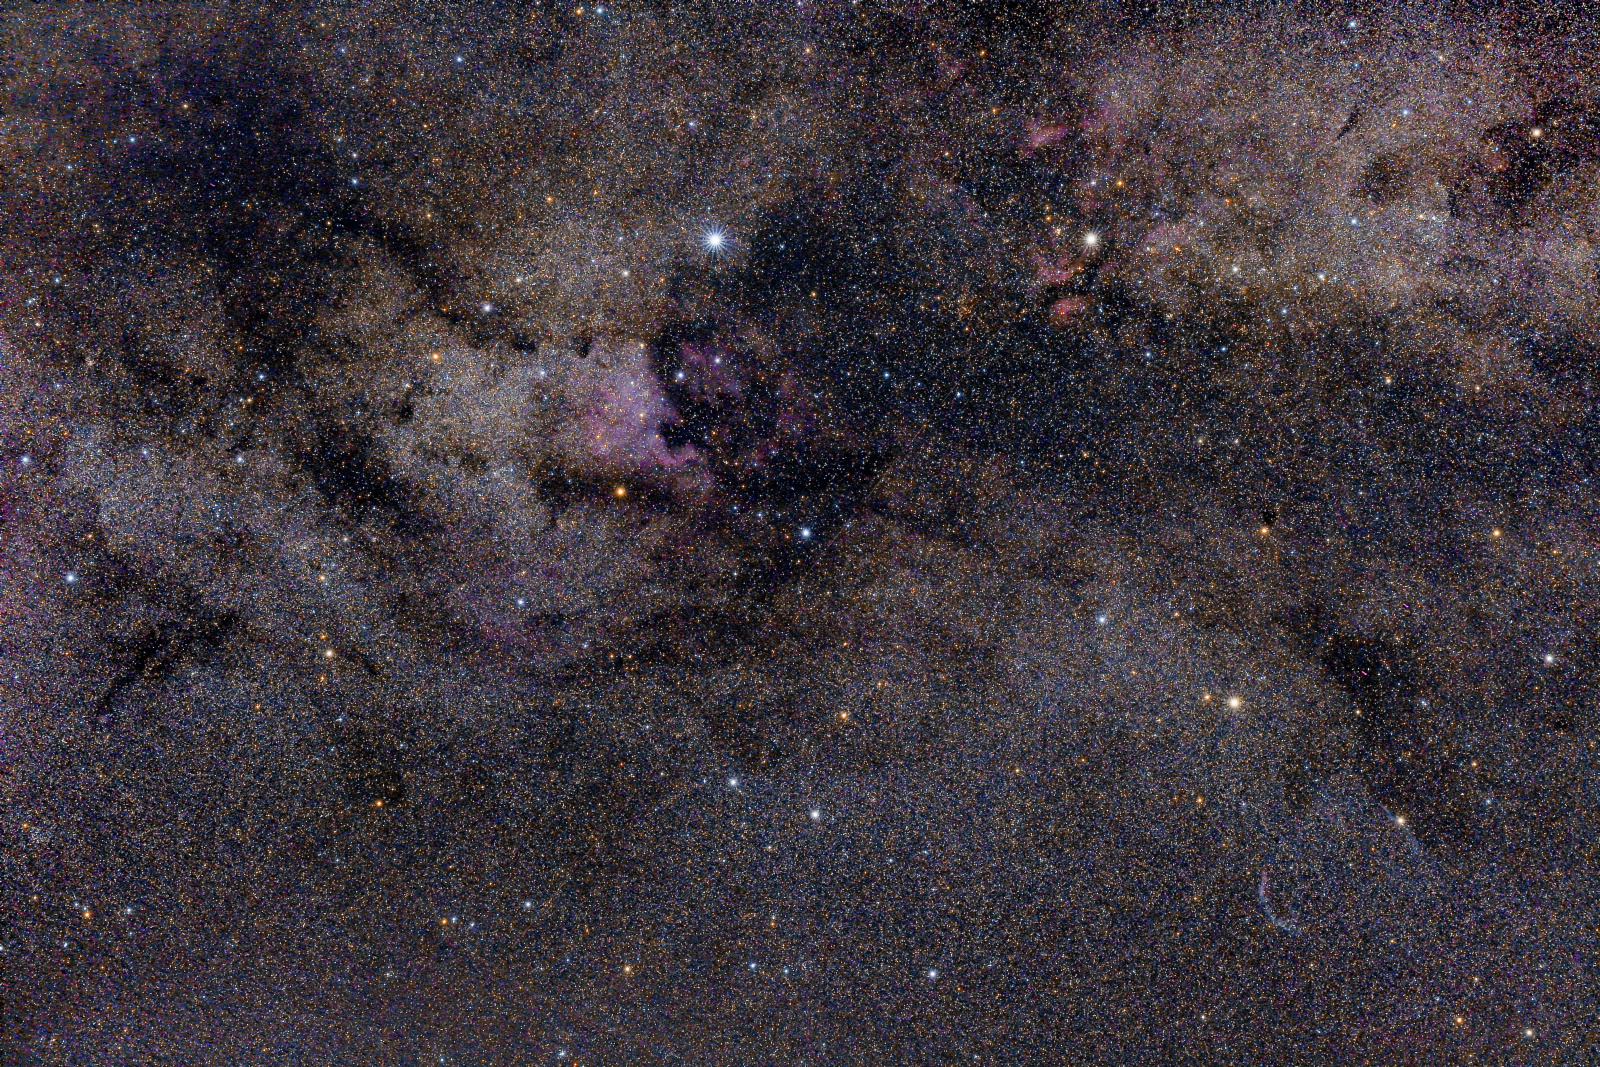 cygnus4_PIX.thumb.jpg.81a8b752eee9501af02c68b21ec8b6a7.jpg